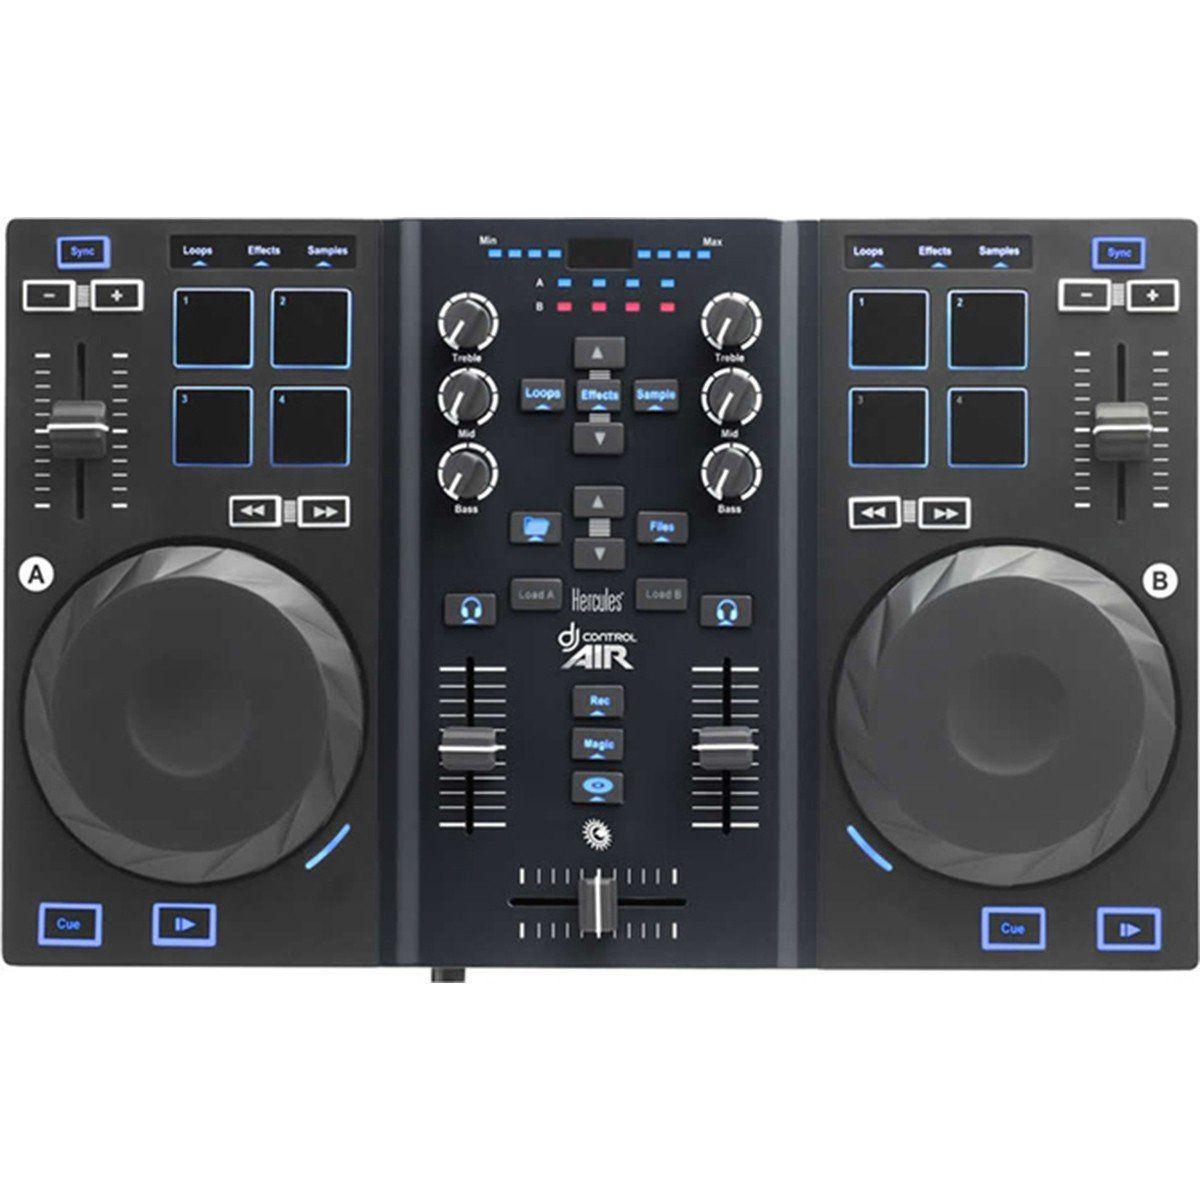 Usado - Controladora Dj Hercules DJ Control Air Usb